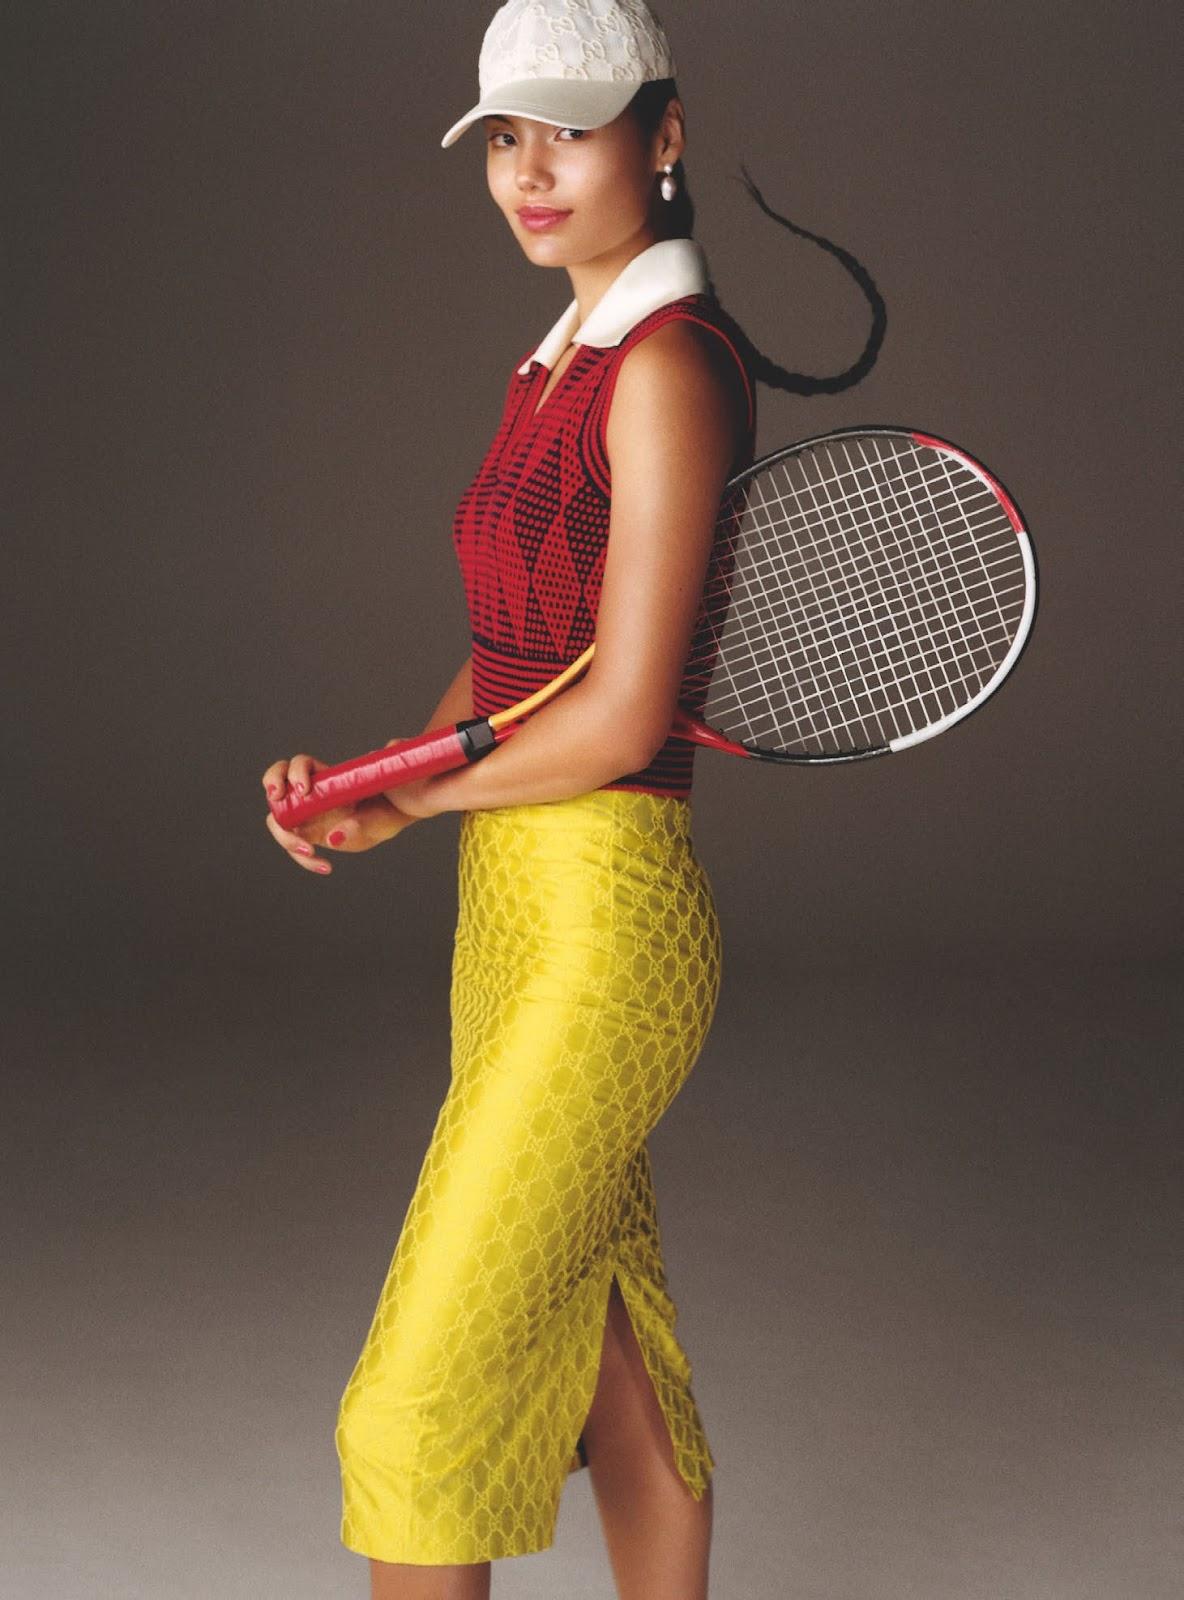 SMILE: Emma Raducanu in British Vogue October 2021 by Scott Trindle